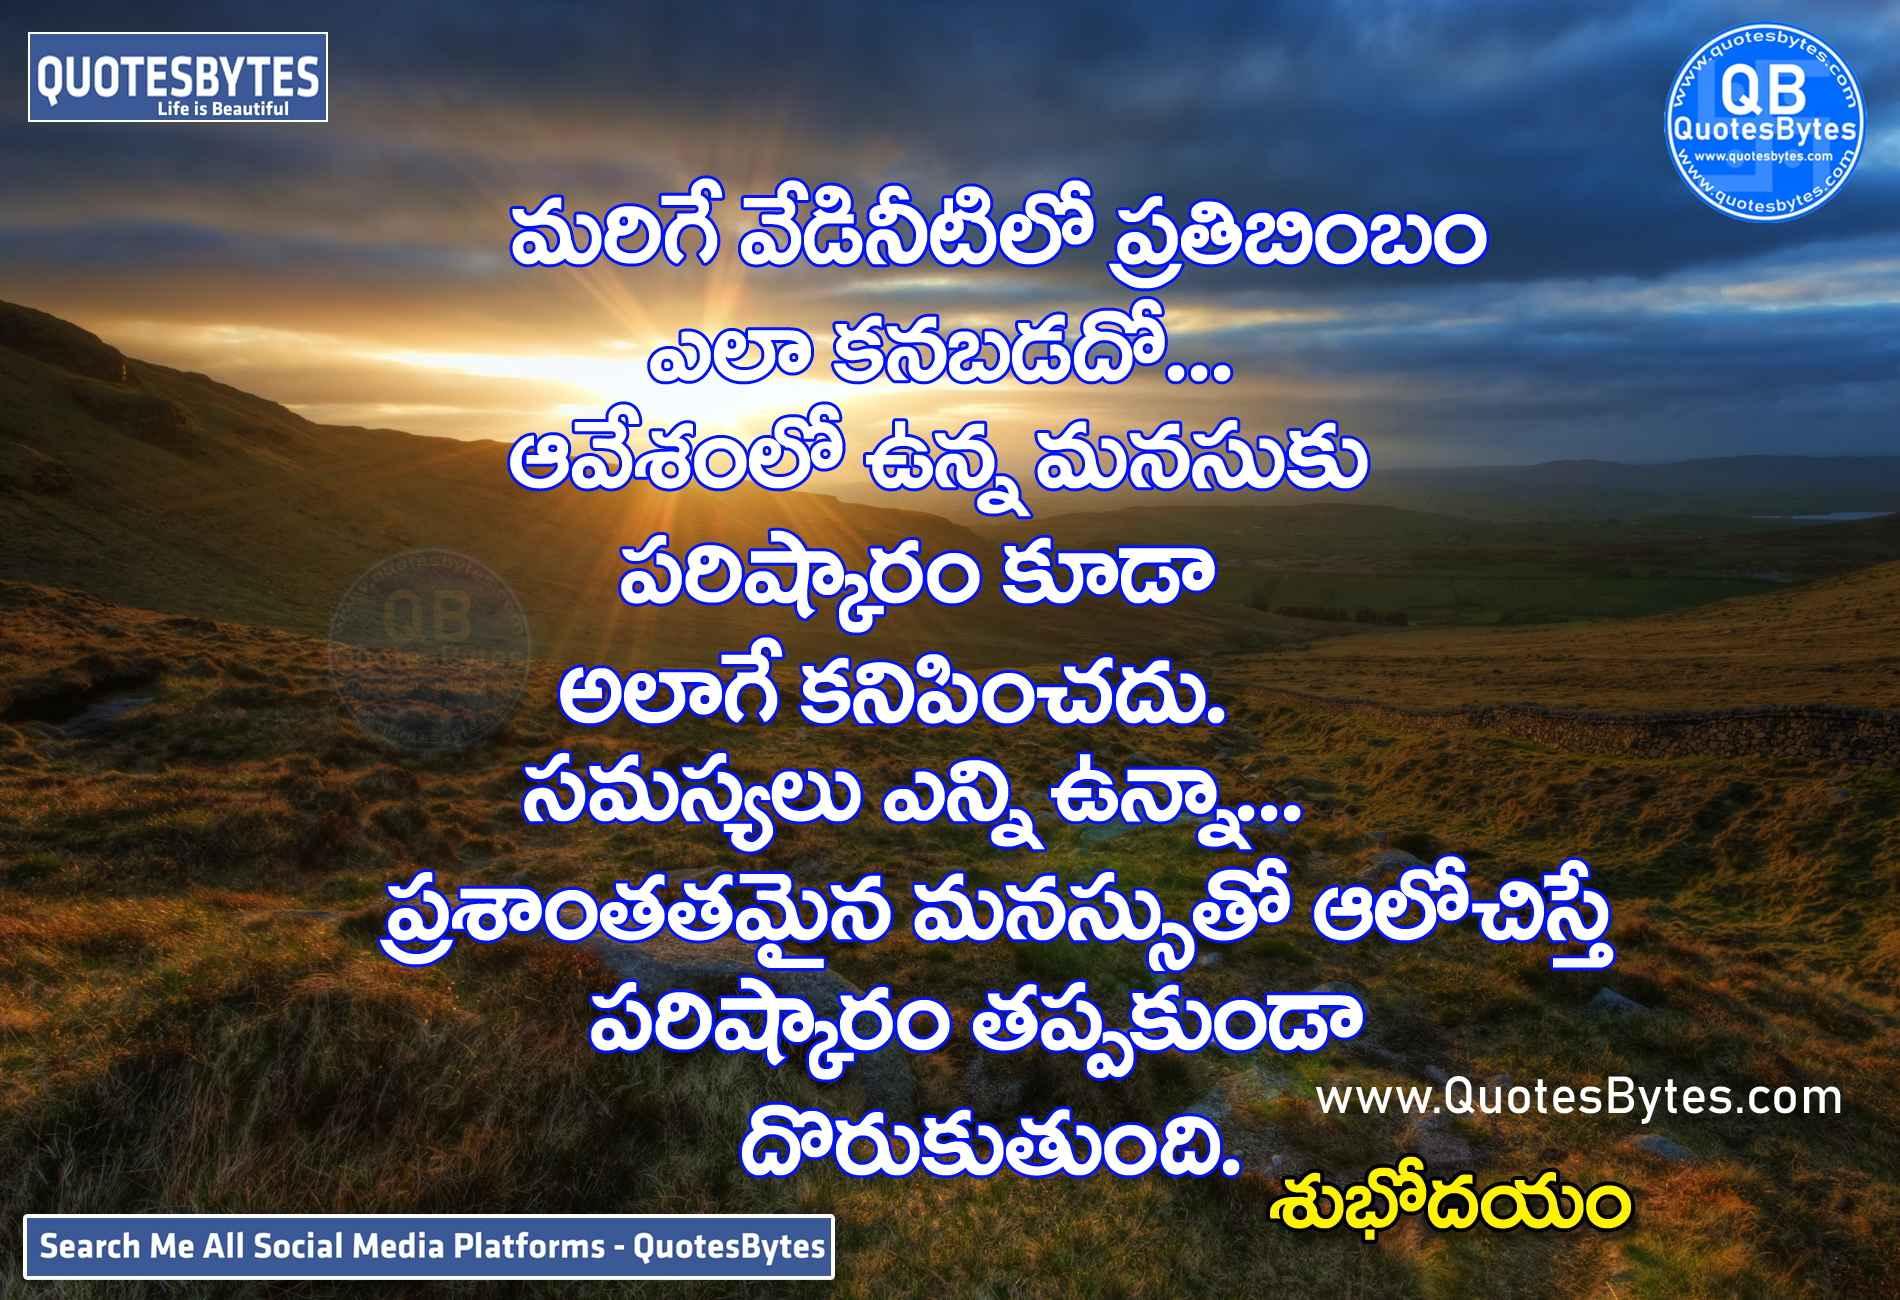 good morning images in telugu-Inspirational Good Morning Quotes in Telugu